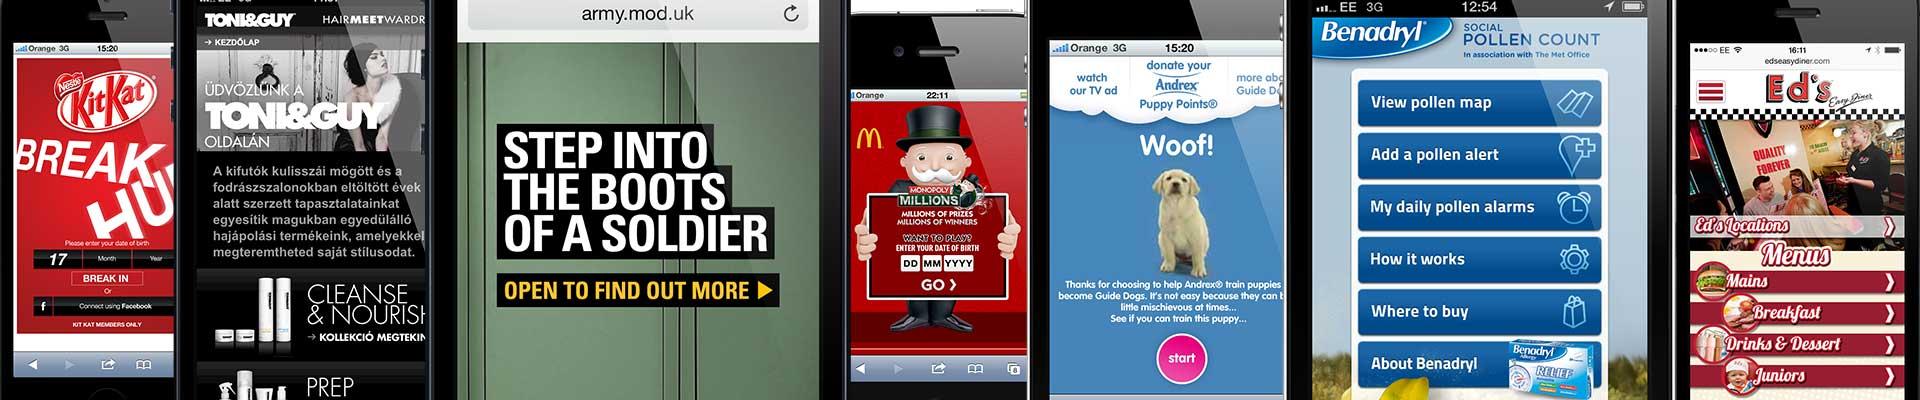 Mobile application designs